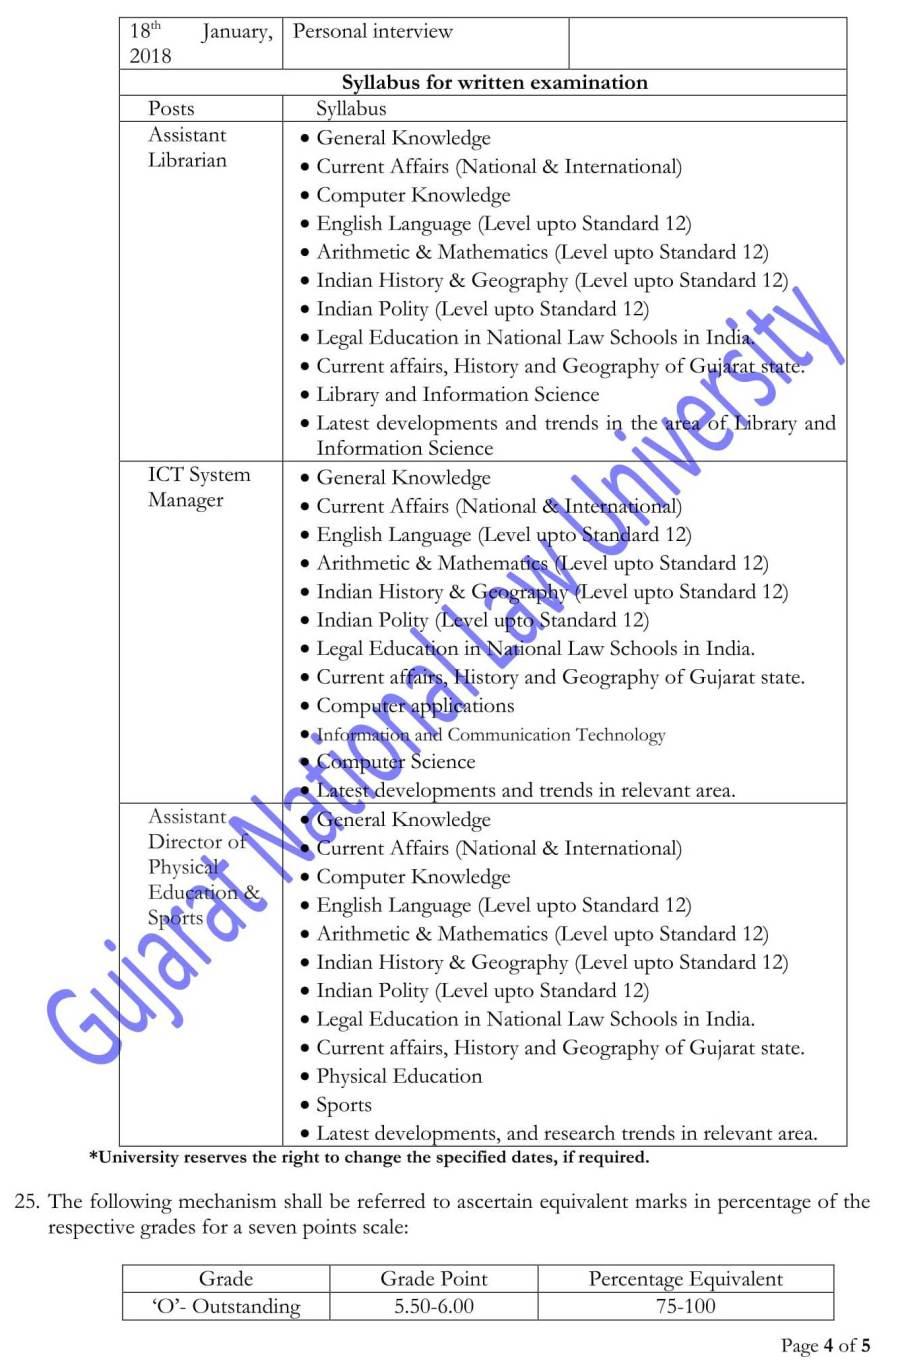 Eligibility for Non-Teaching Posts-4.jpg